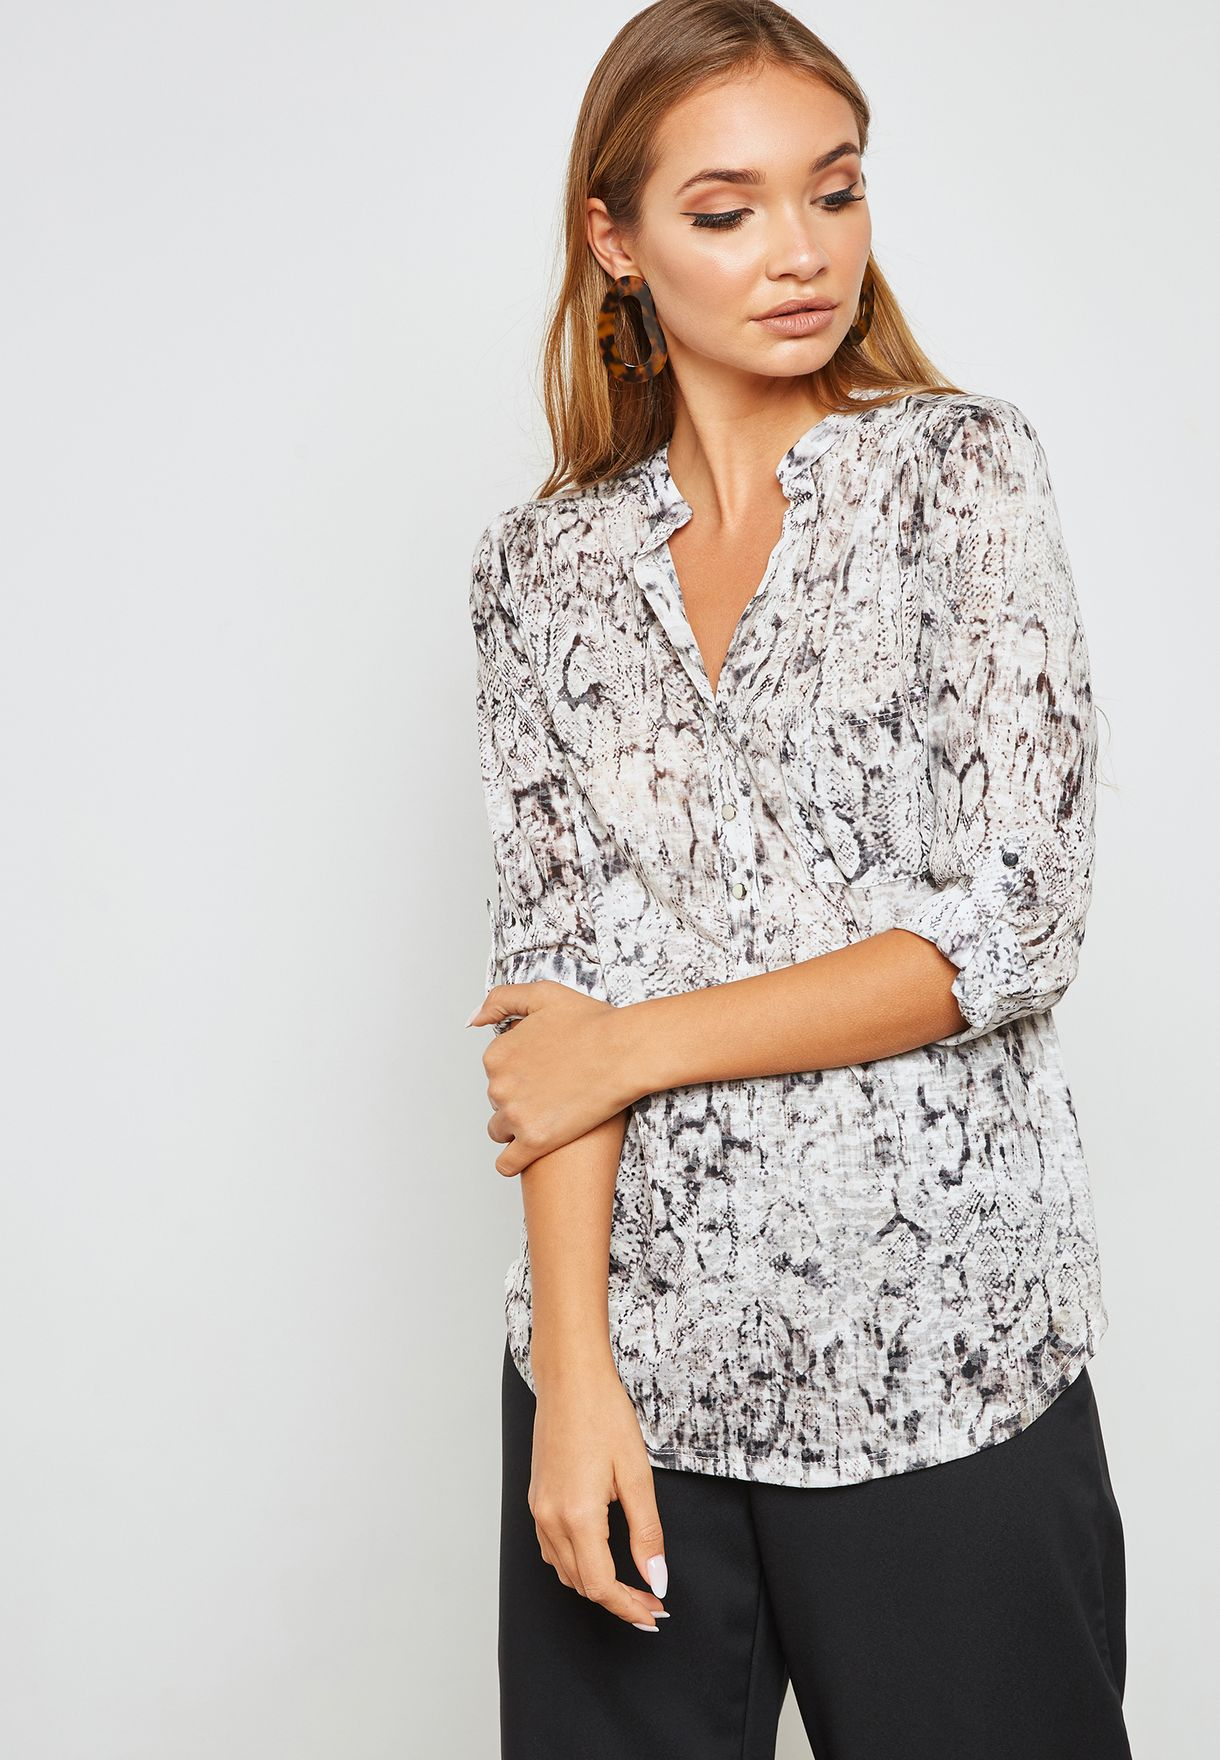 706ba3fb5d552 Shop Wallis prints Snake Print Shirt 254422137 for Women in UAE ...